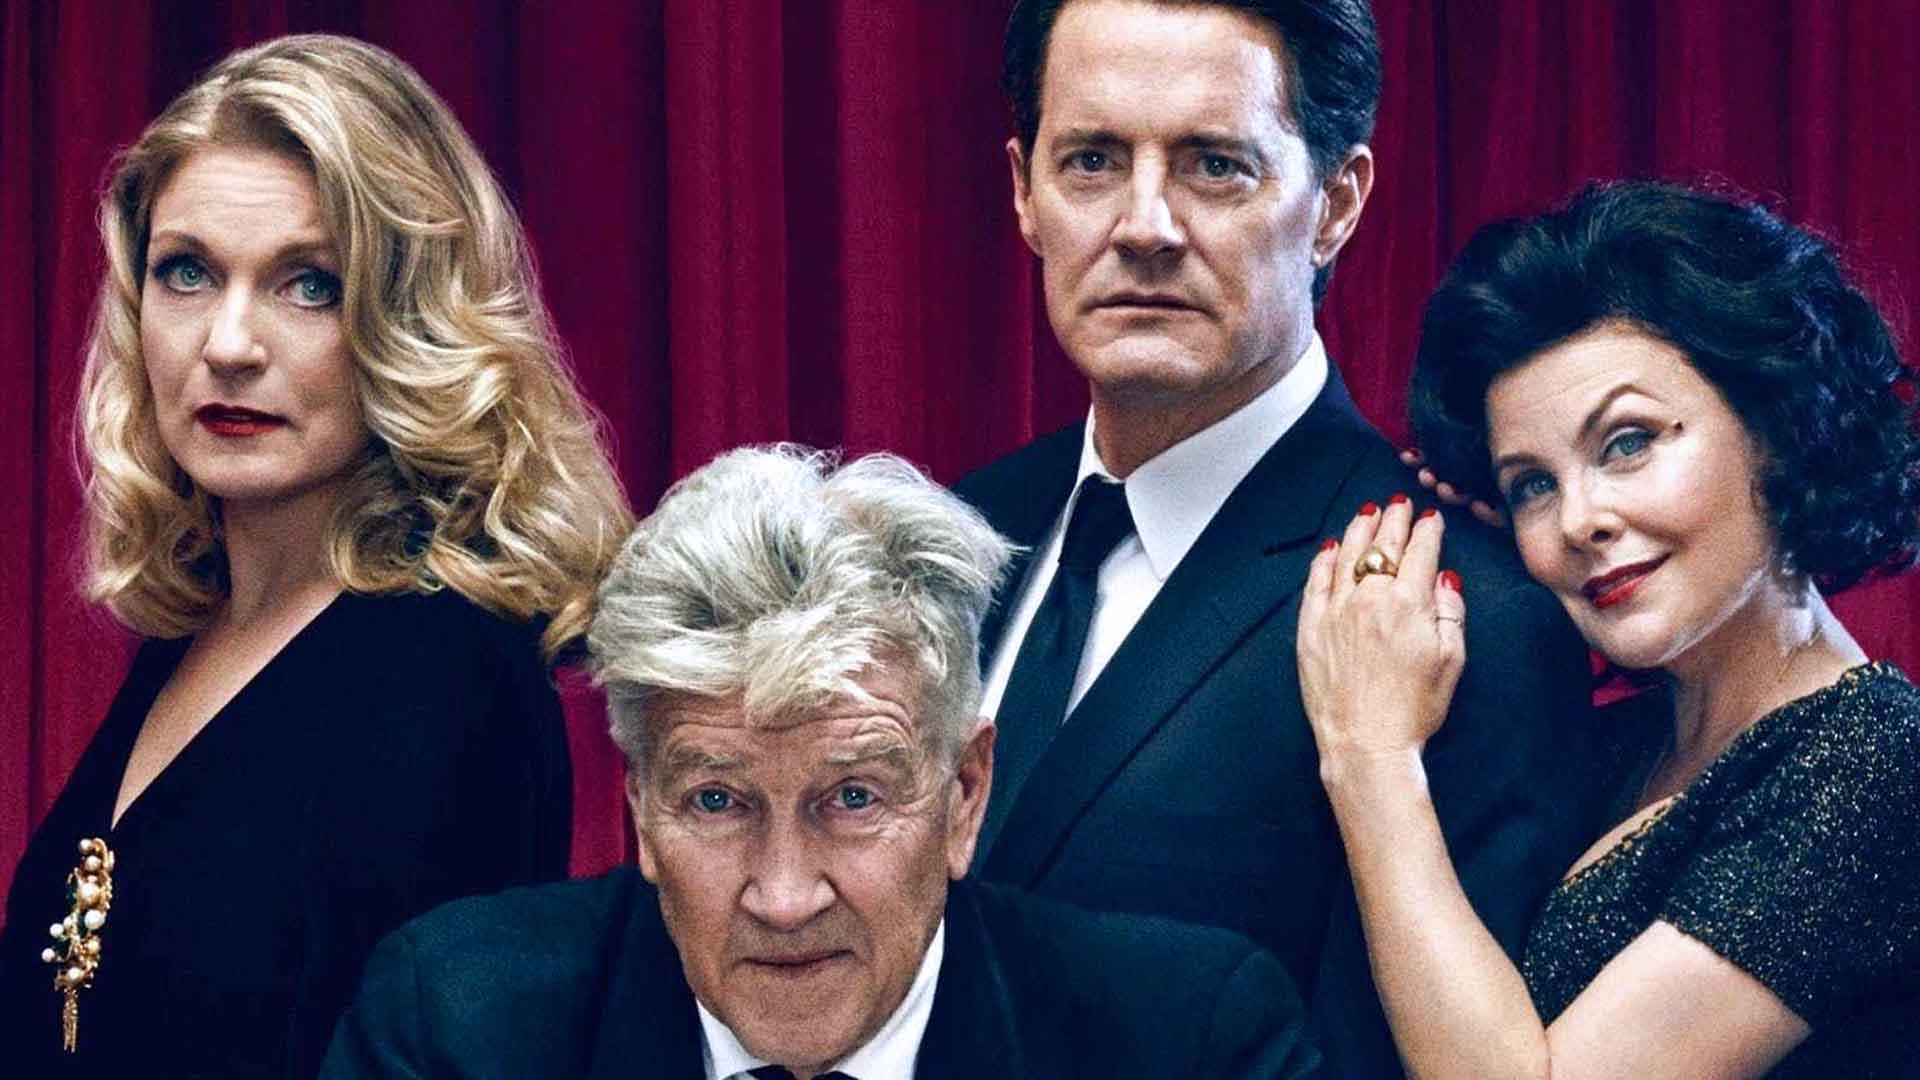 Nel 2017 è uscita Twin Peaks 3